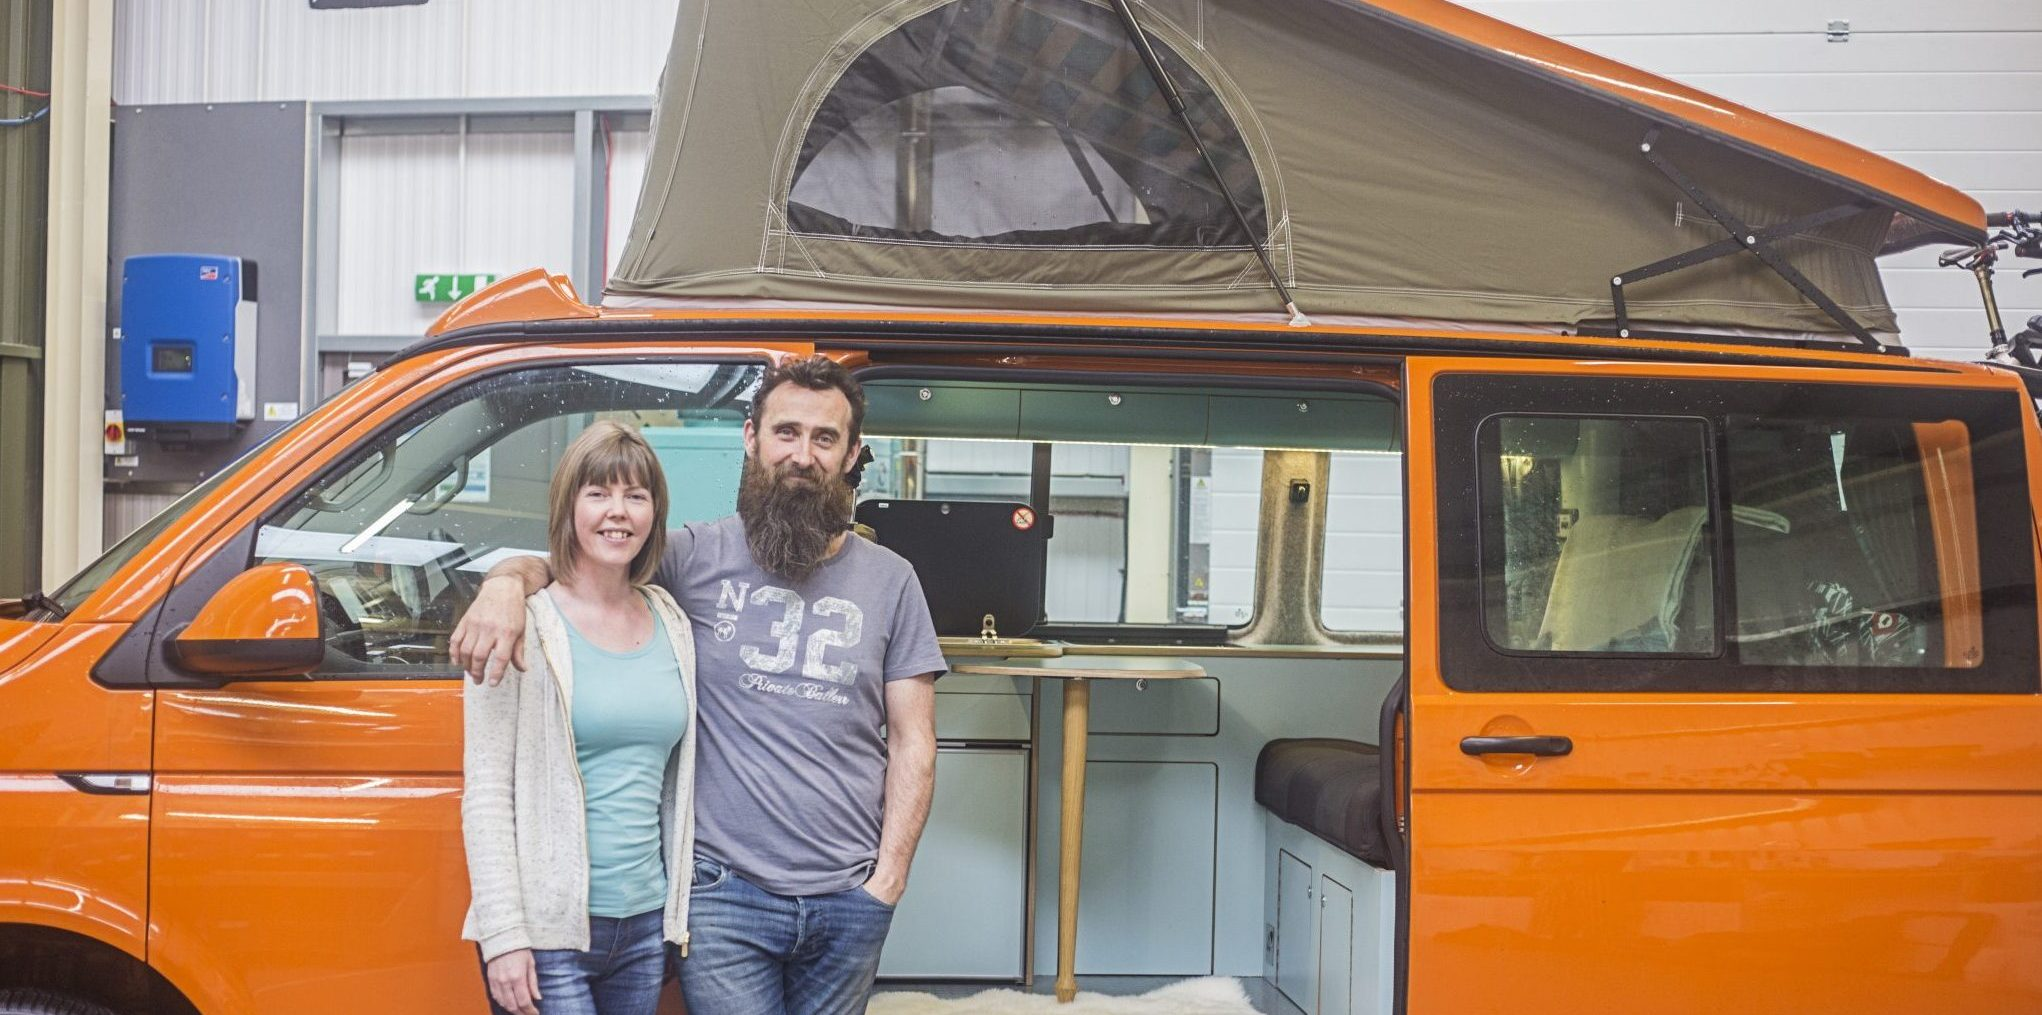 campervan project